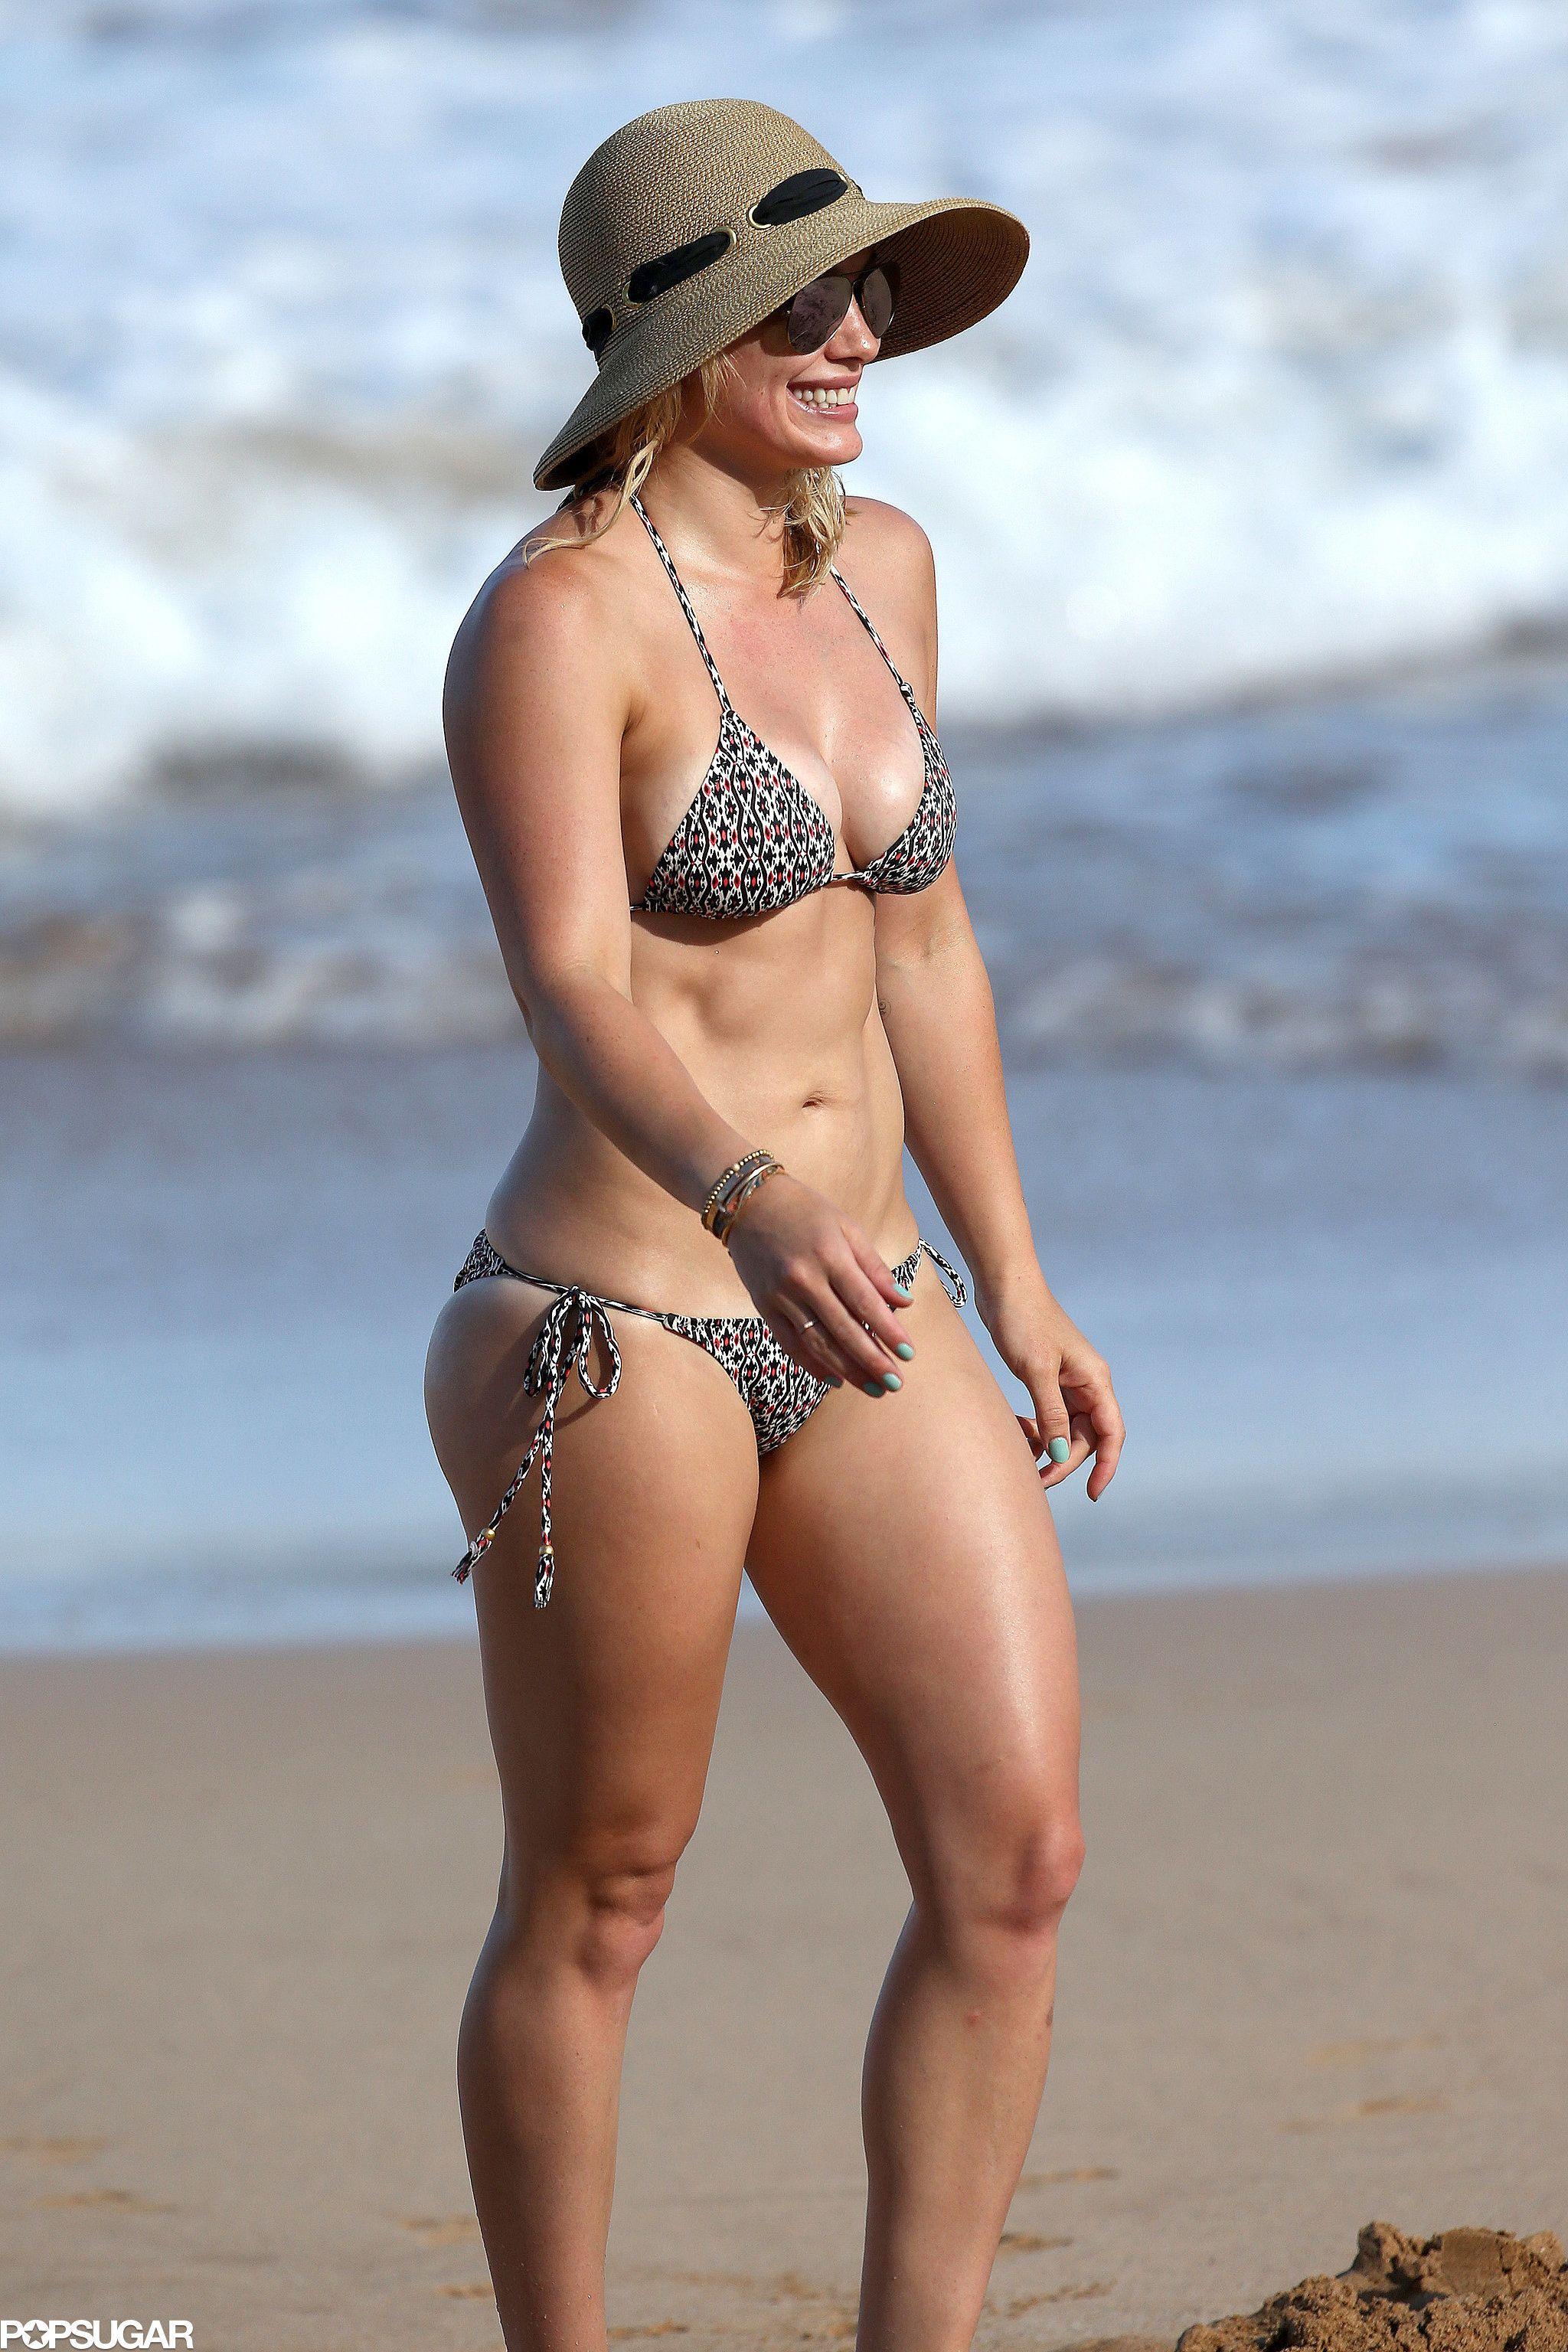 Bikini Stephanie Borja nudes (72 photos), Pussy, Paparazzi, Boobs, cleavage 2020